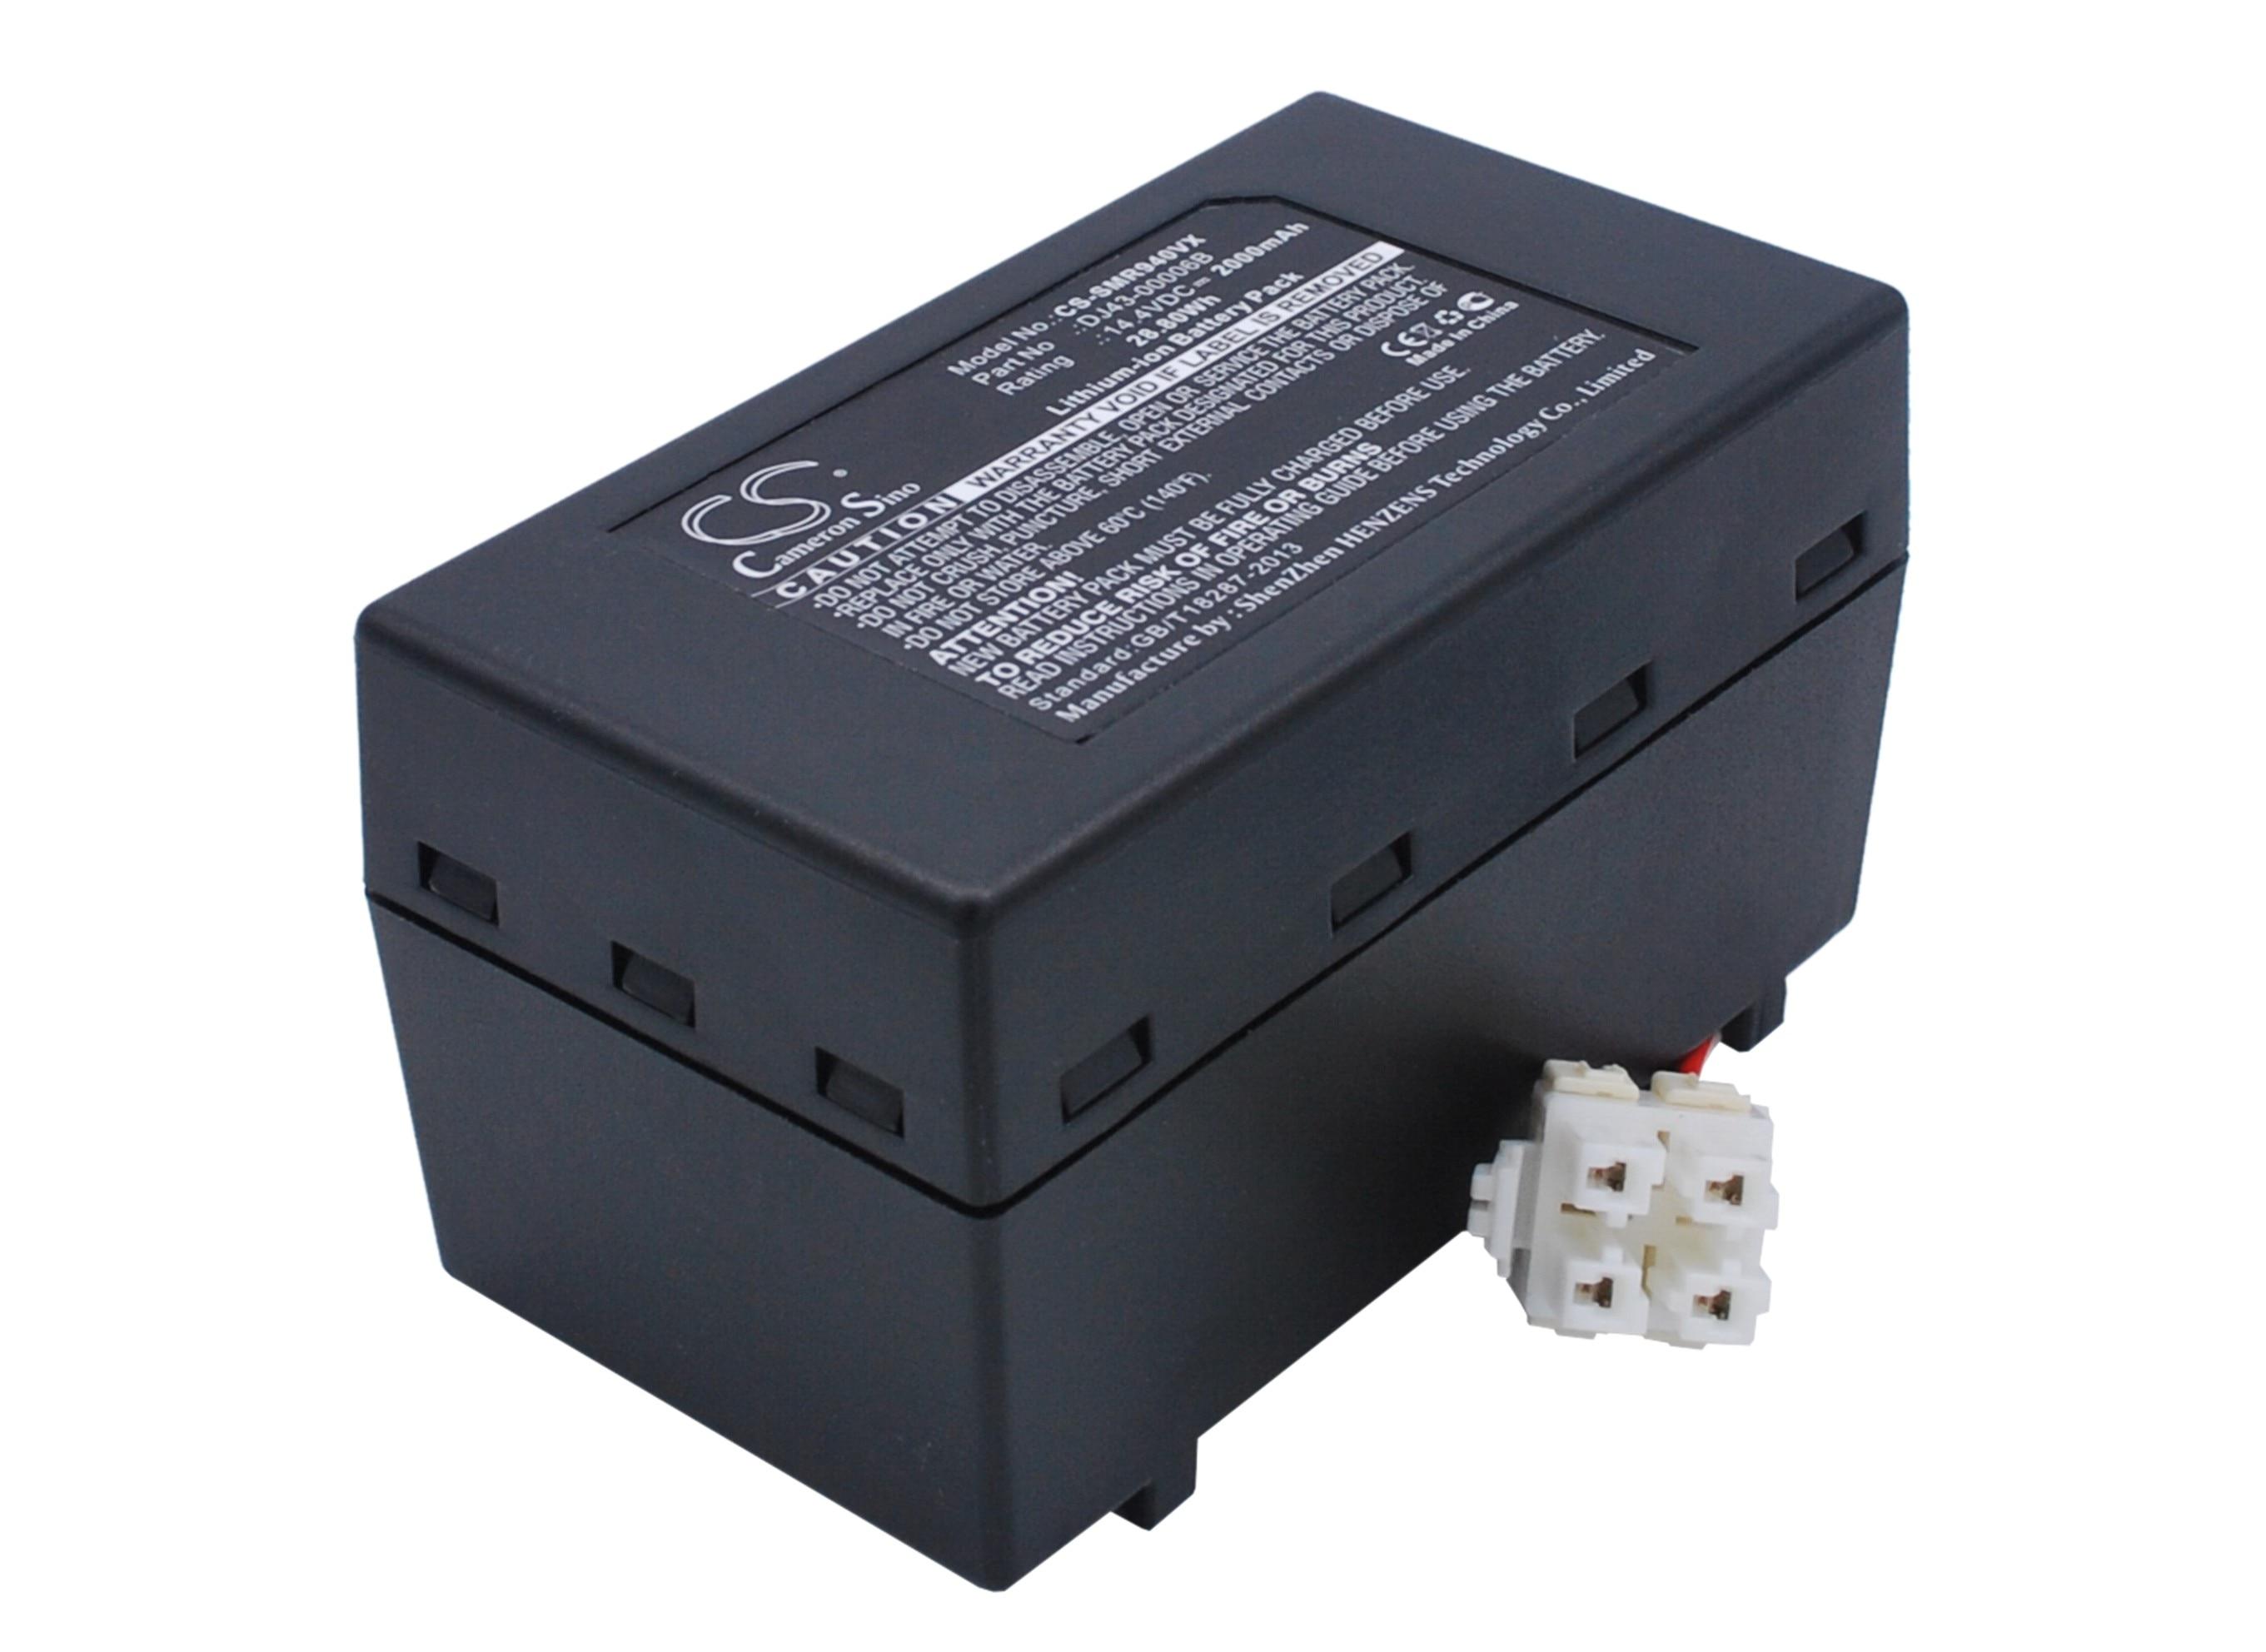 Pda Pocket Pc Battery For Mitac Mio A500 A501 A502 1200 Mah Motorola W370 W375 Service Manual Cameron Sino Upgraded Samsung Dj43 00006bdj96 00152b Vacuum Li